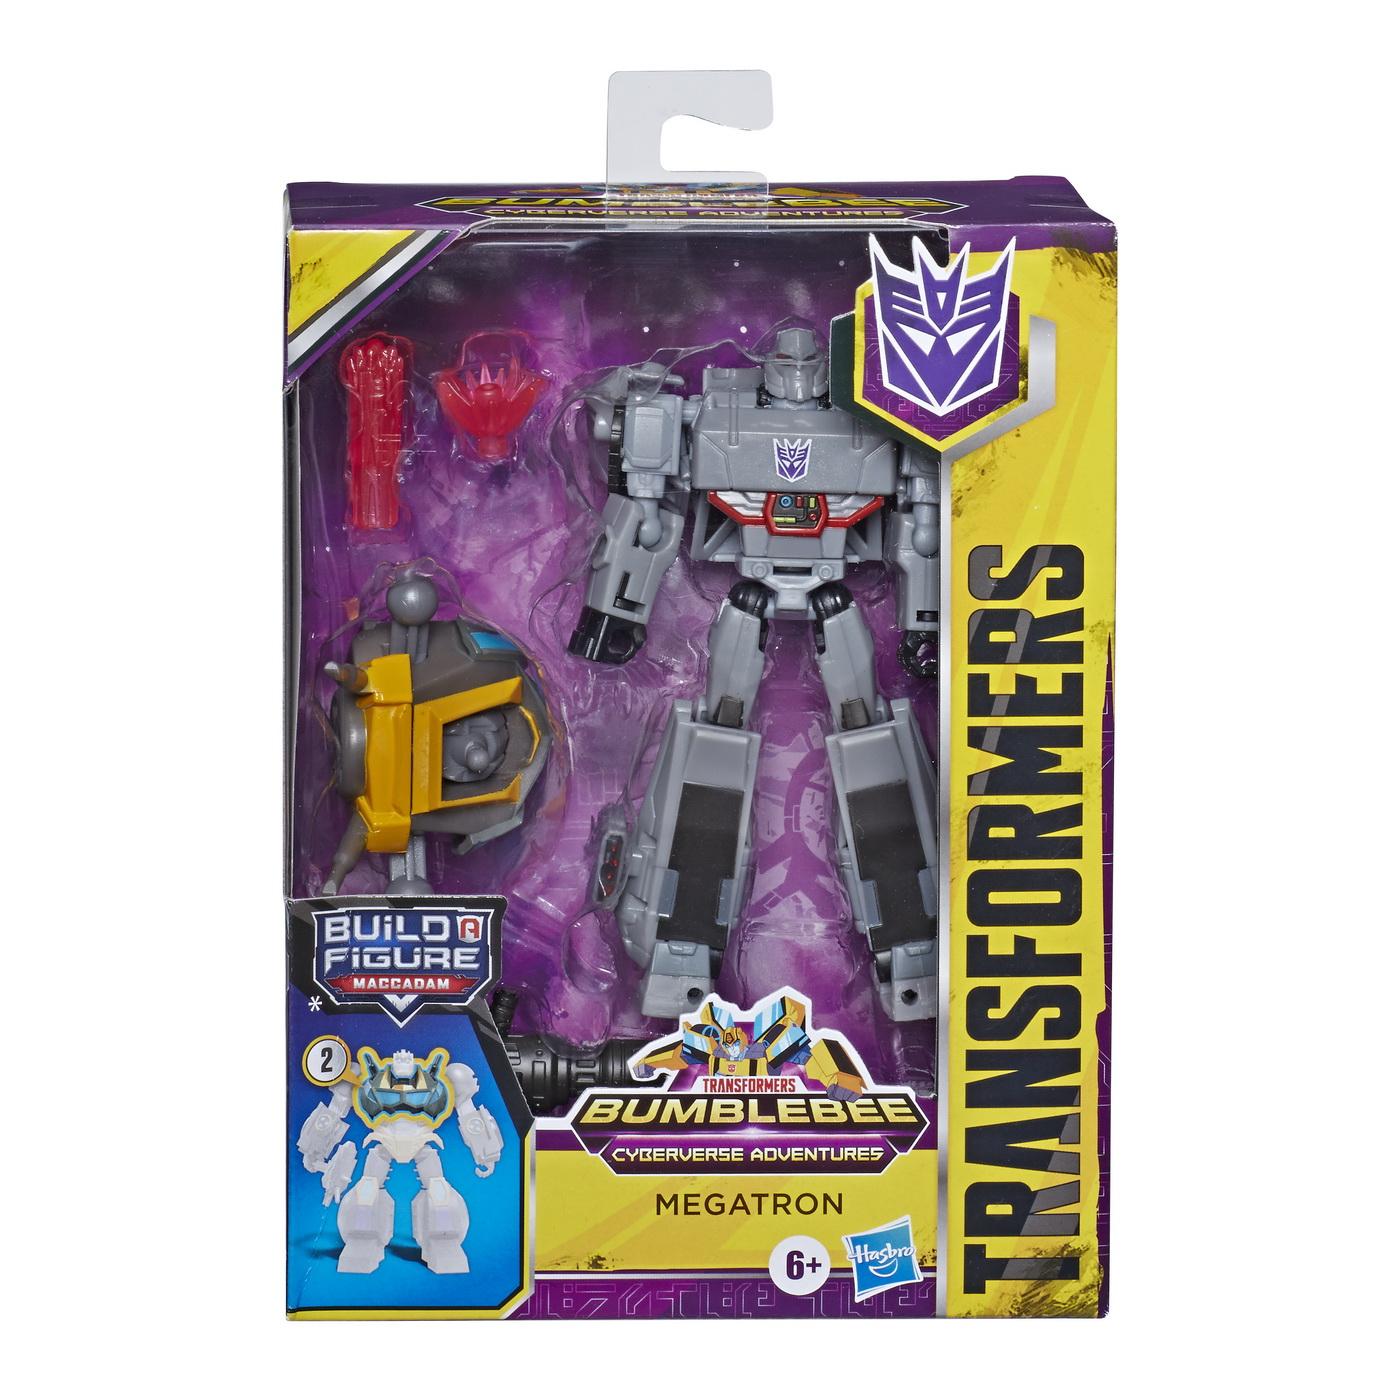 Transformers Robot Vehicul Cyberverse Deluxe Megatron